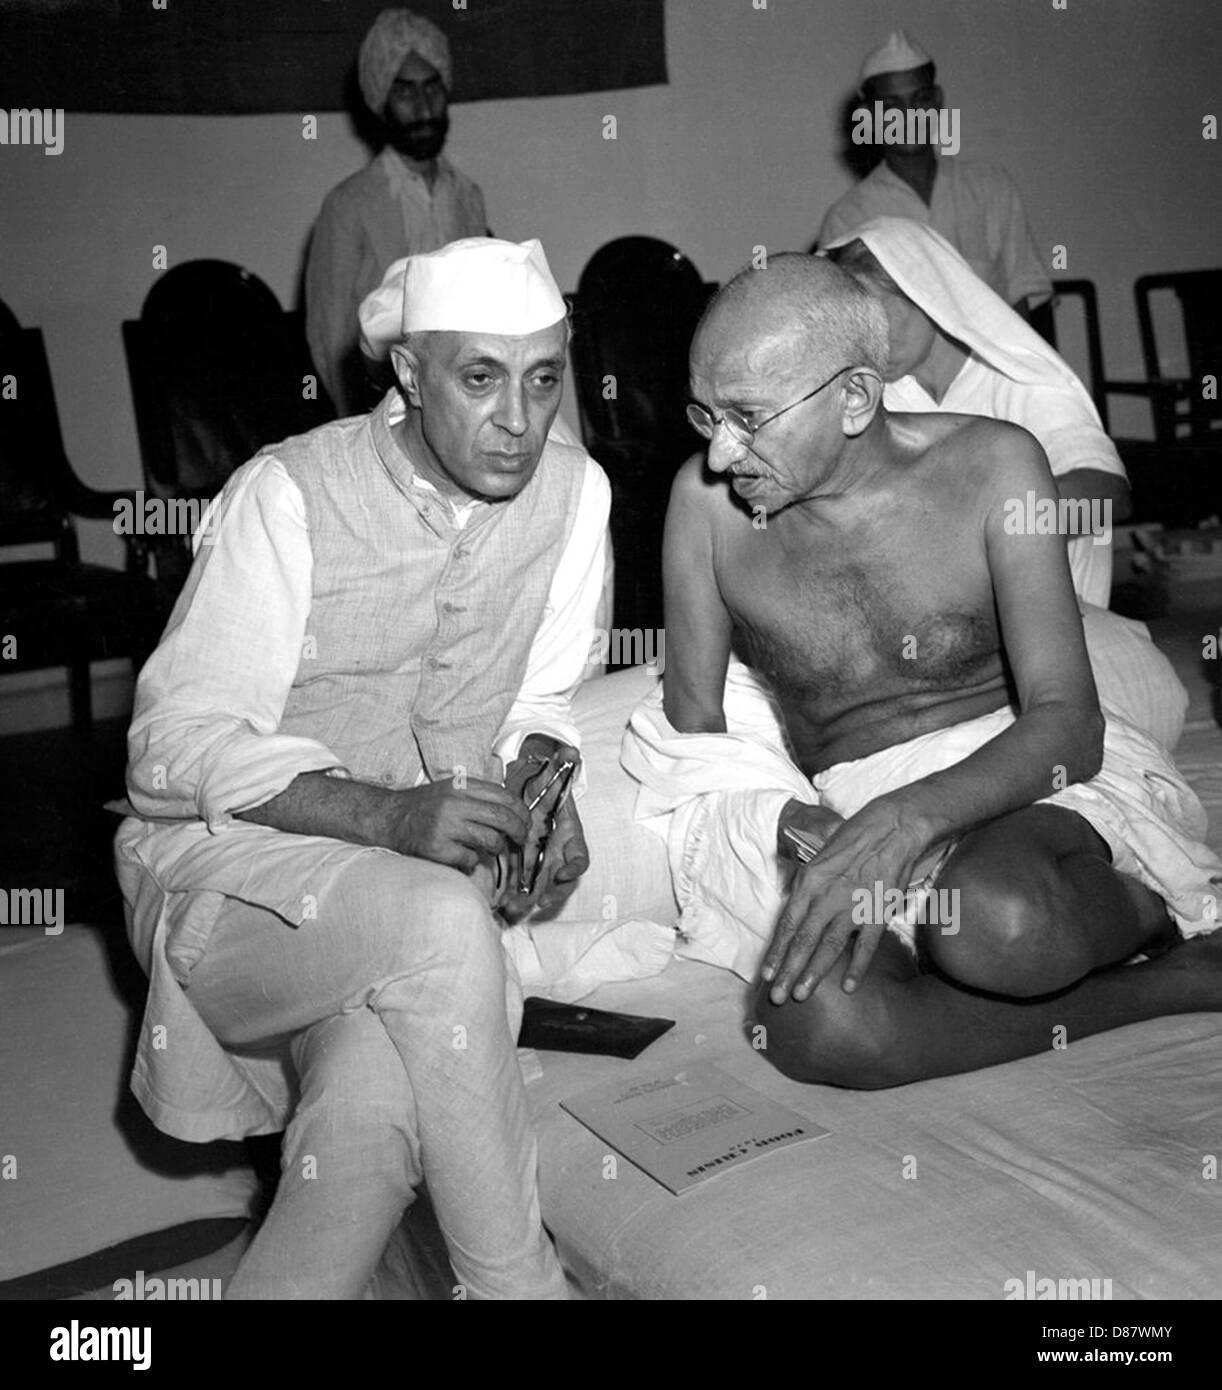 JAWAHARLAL NEHRU a sinistra con il Mahatma Gandhi, indipendenza indiana leader, nel 1942 Immagini Stock